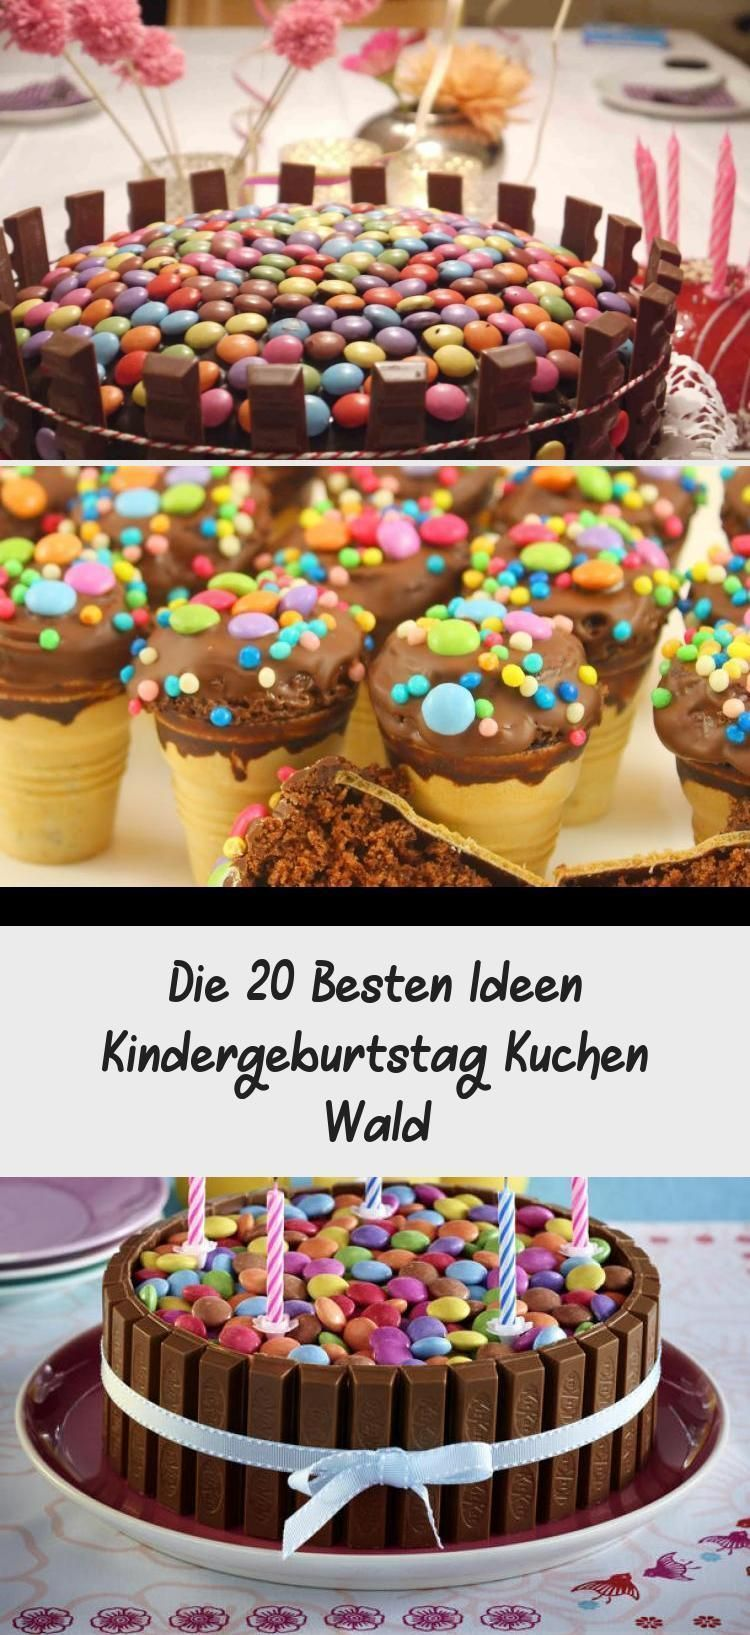 Photo of .Die 20 Besten Ideen Kindergeburtstag Kuchen Wald #PinataKuchenSchoko #PinataKuc…